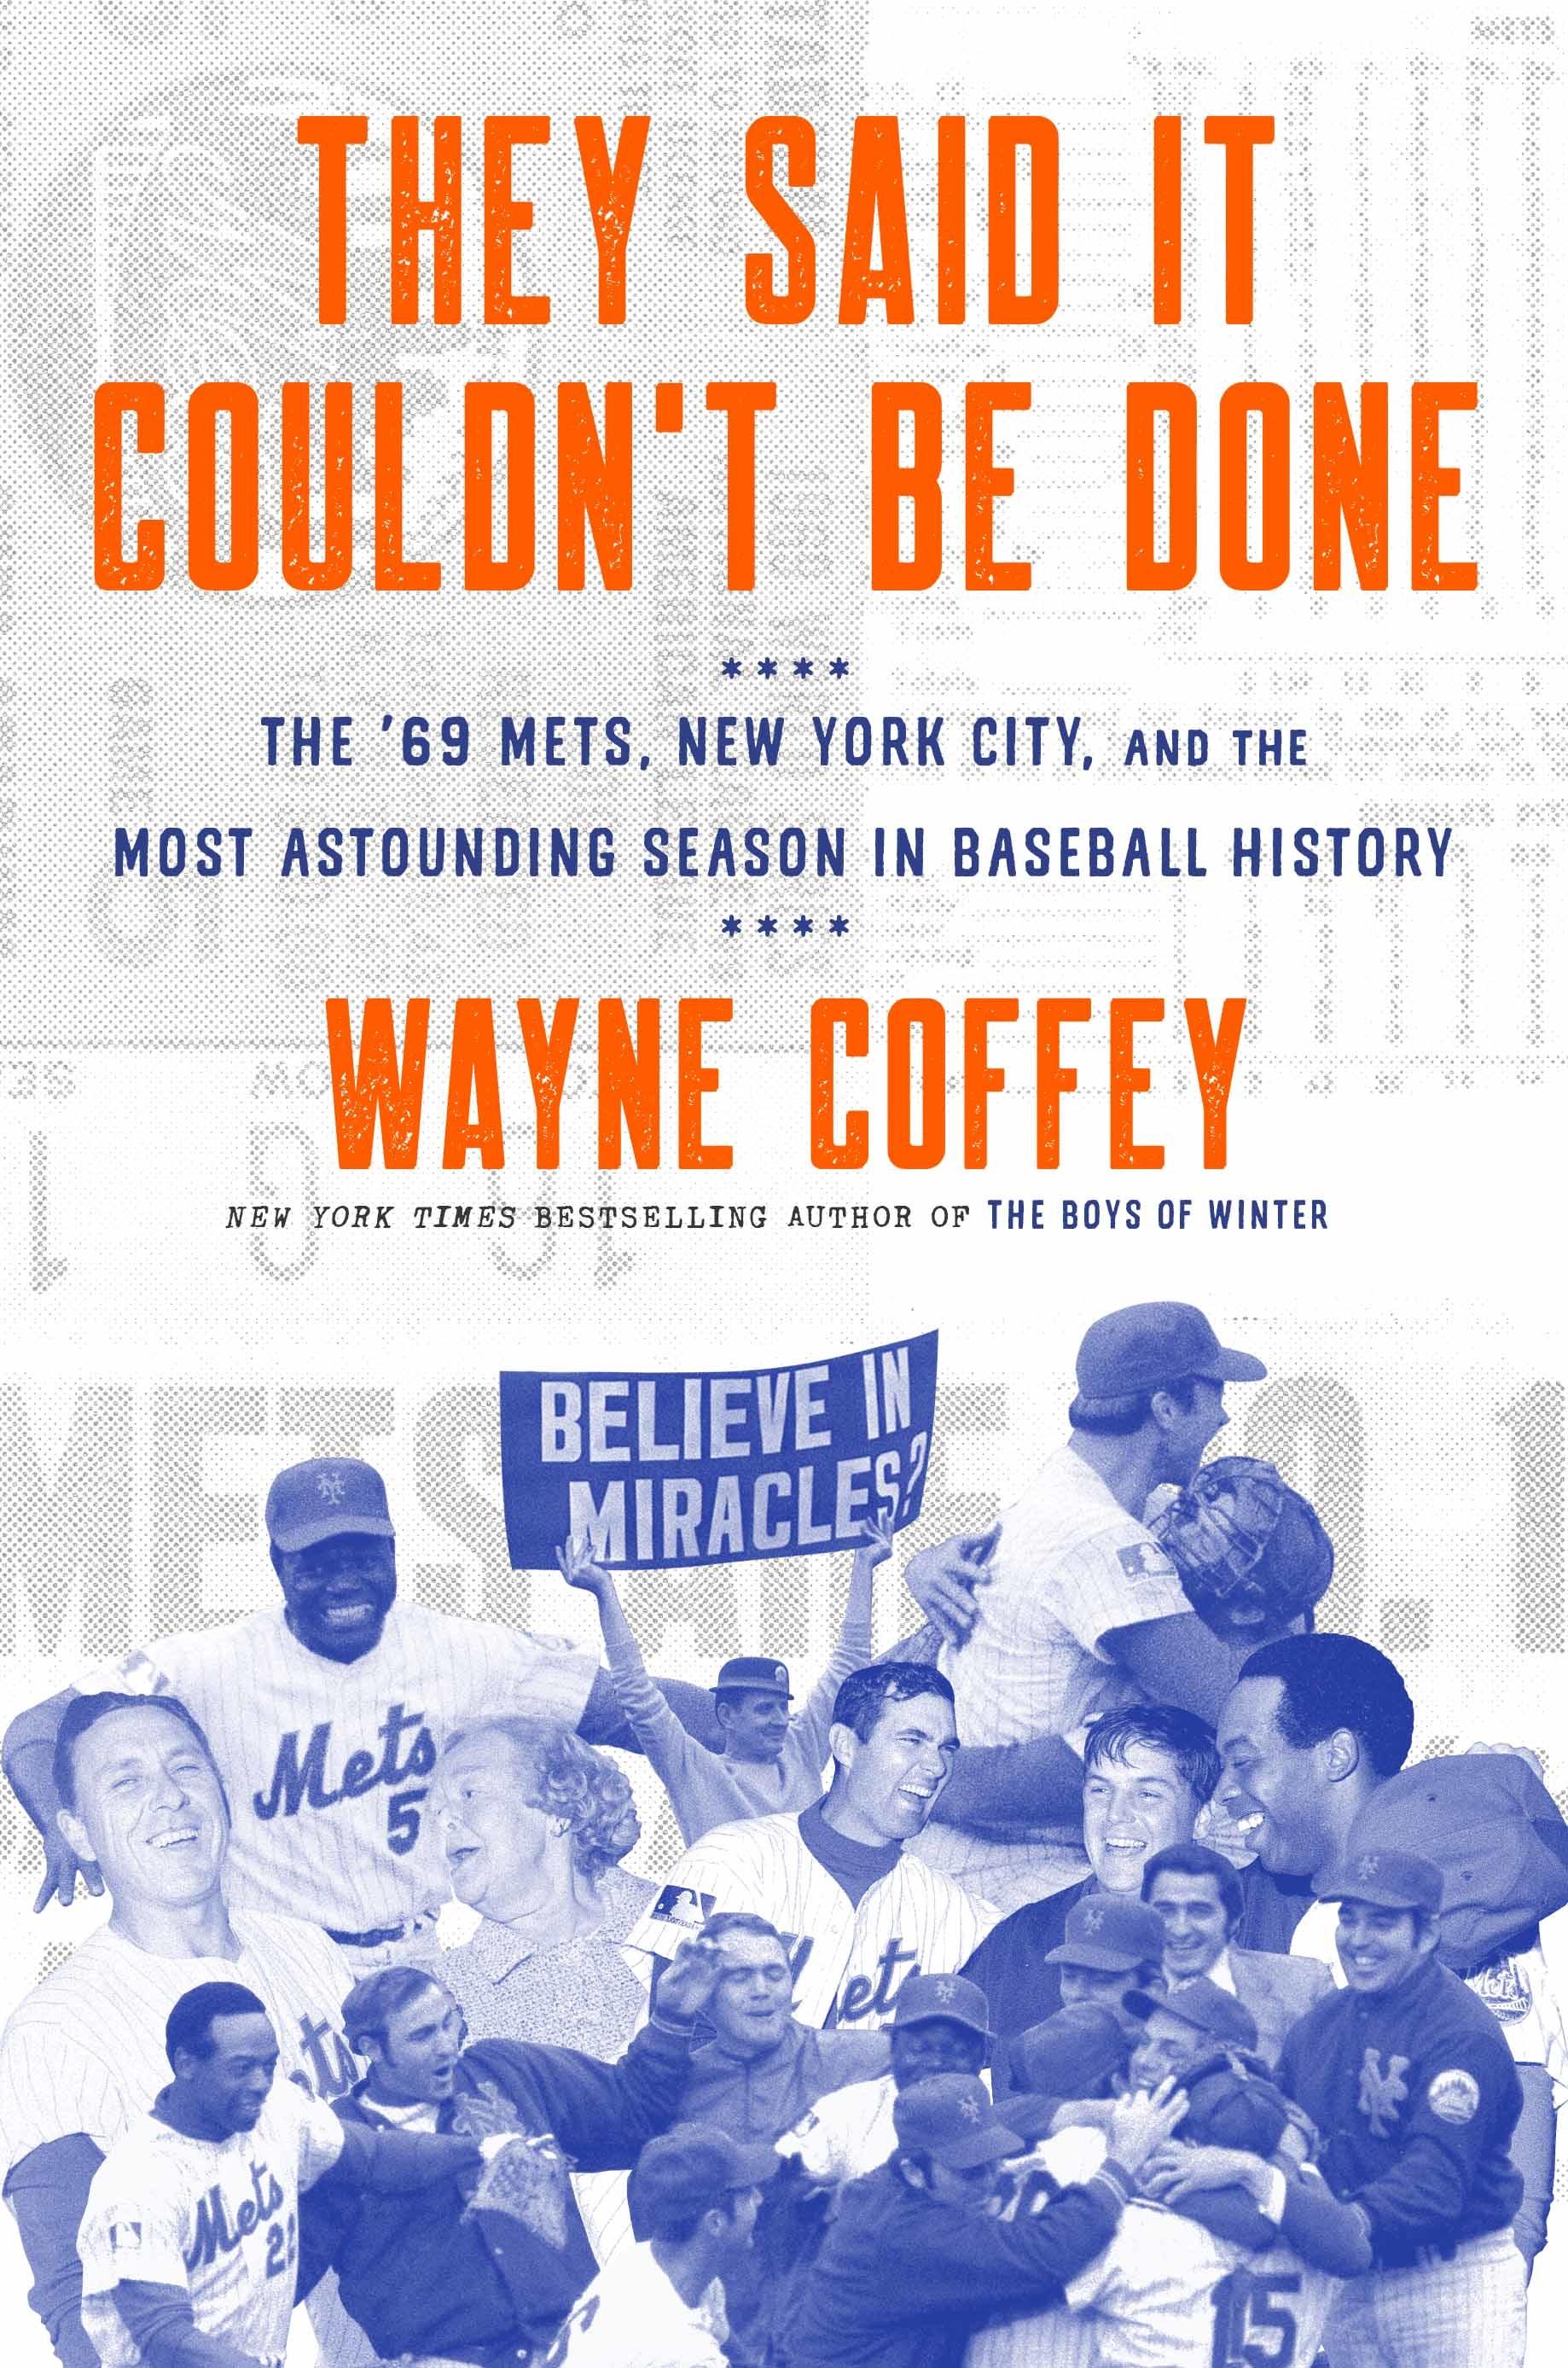 Wayne Coffey 1969 Mets